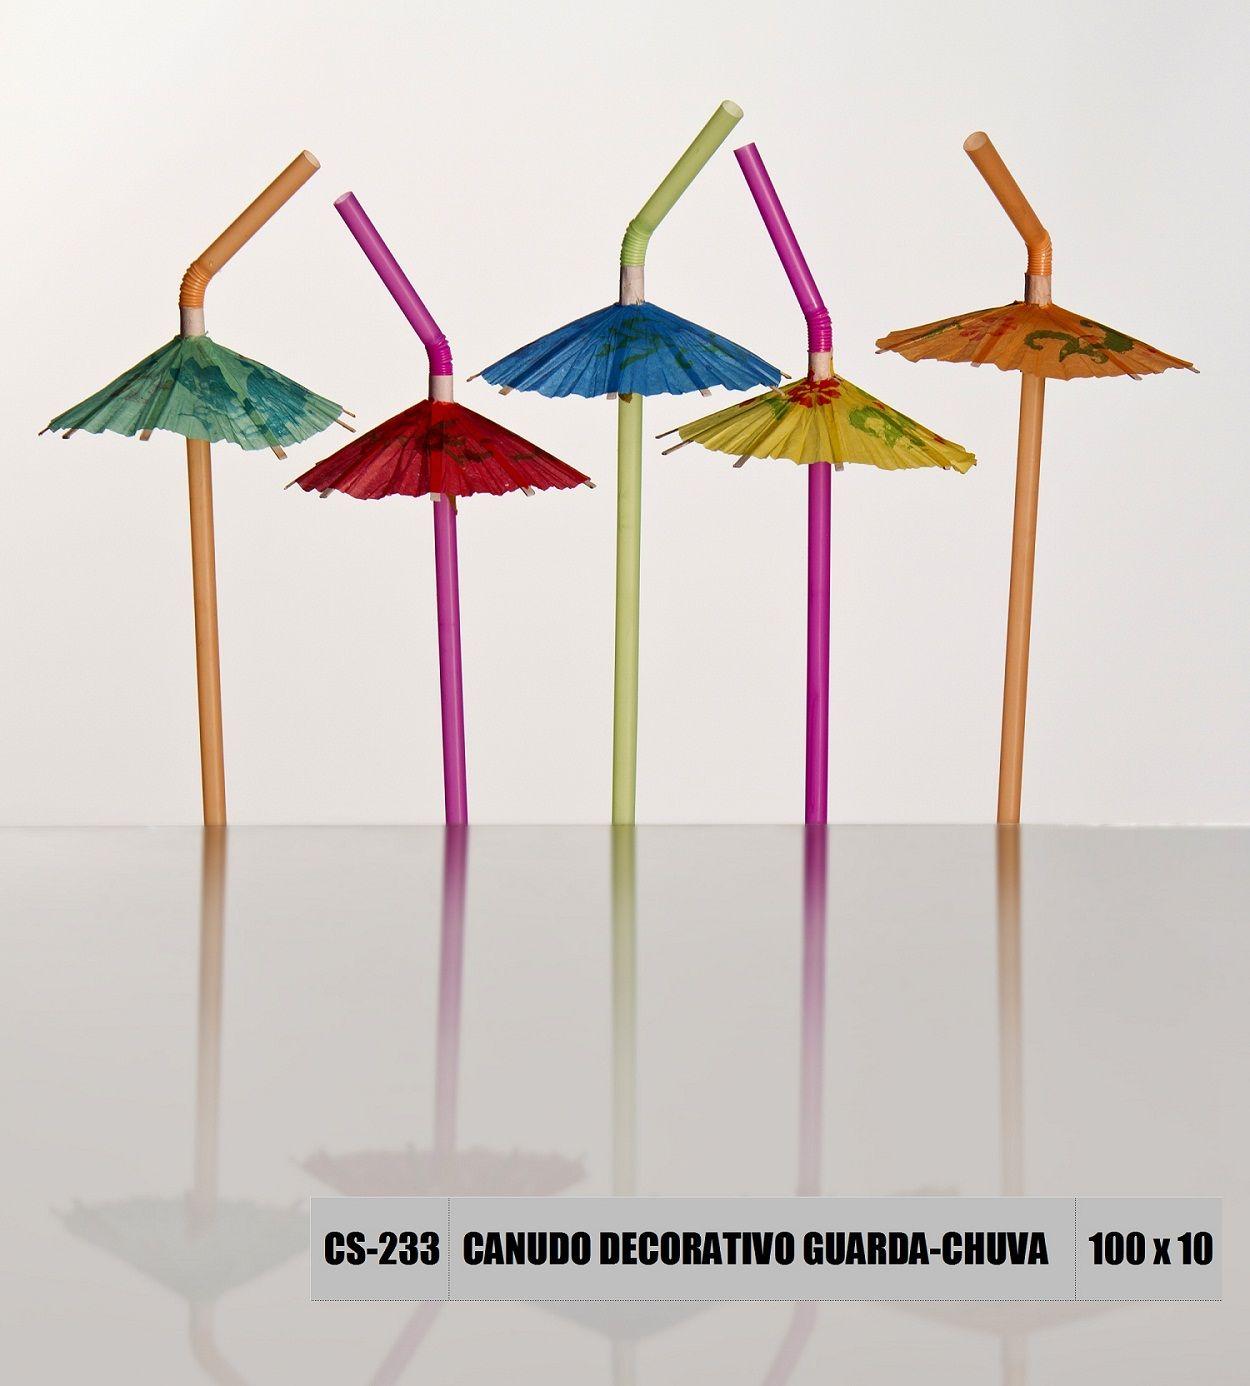 Canudo decorativo guarda-chuva Strawplast